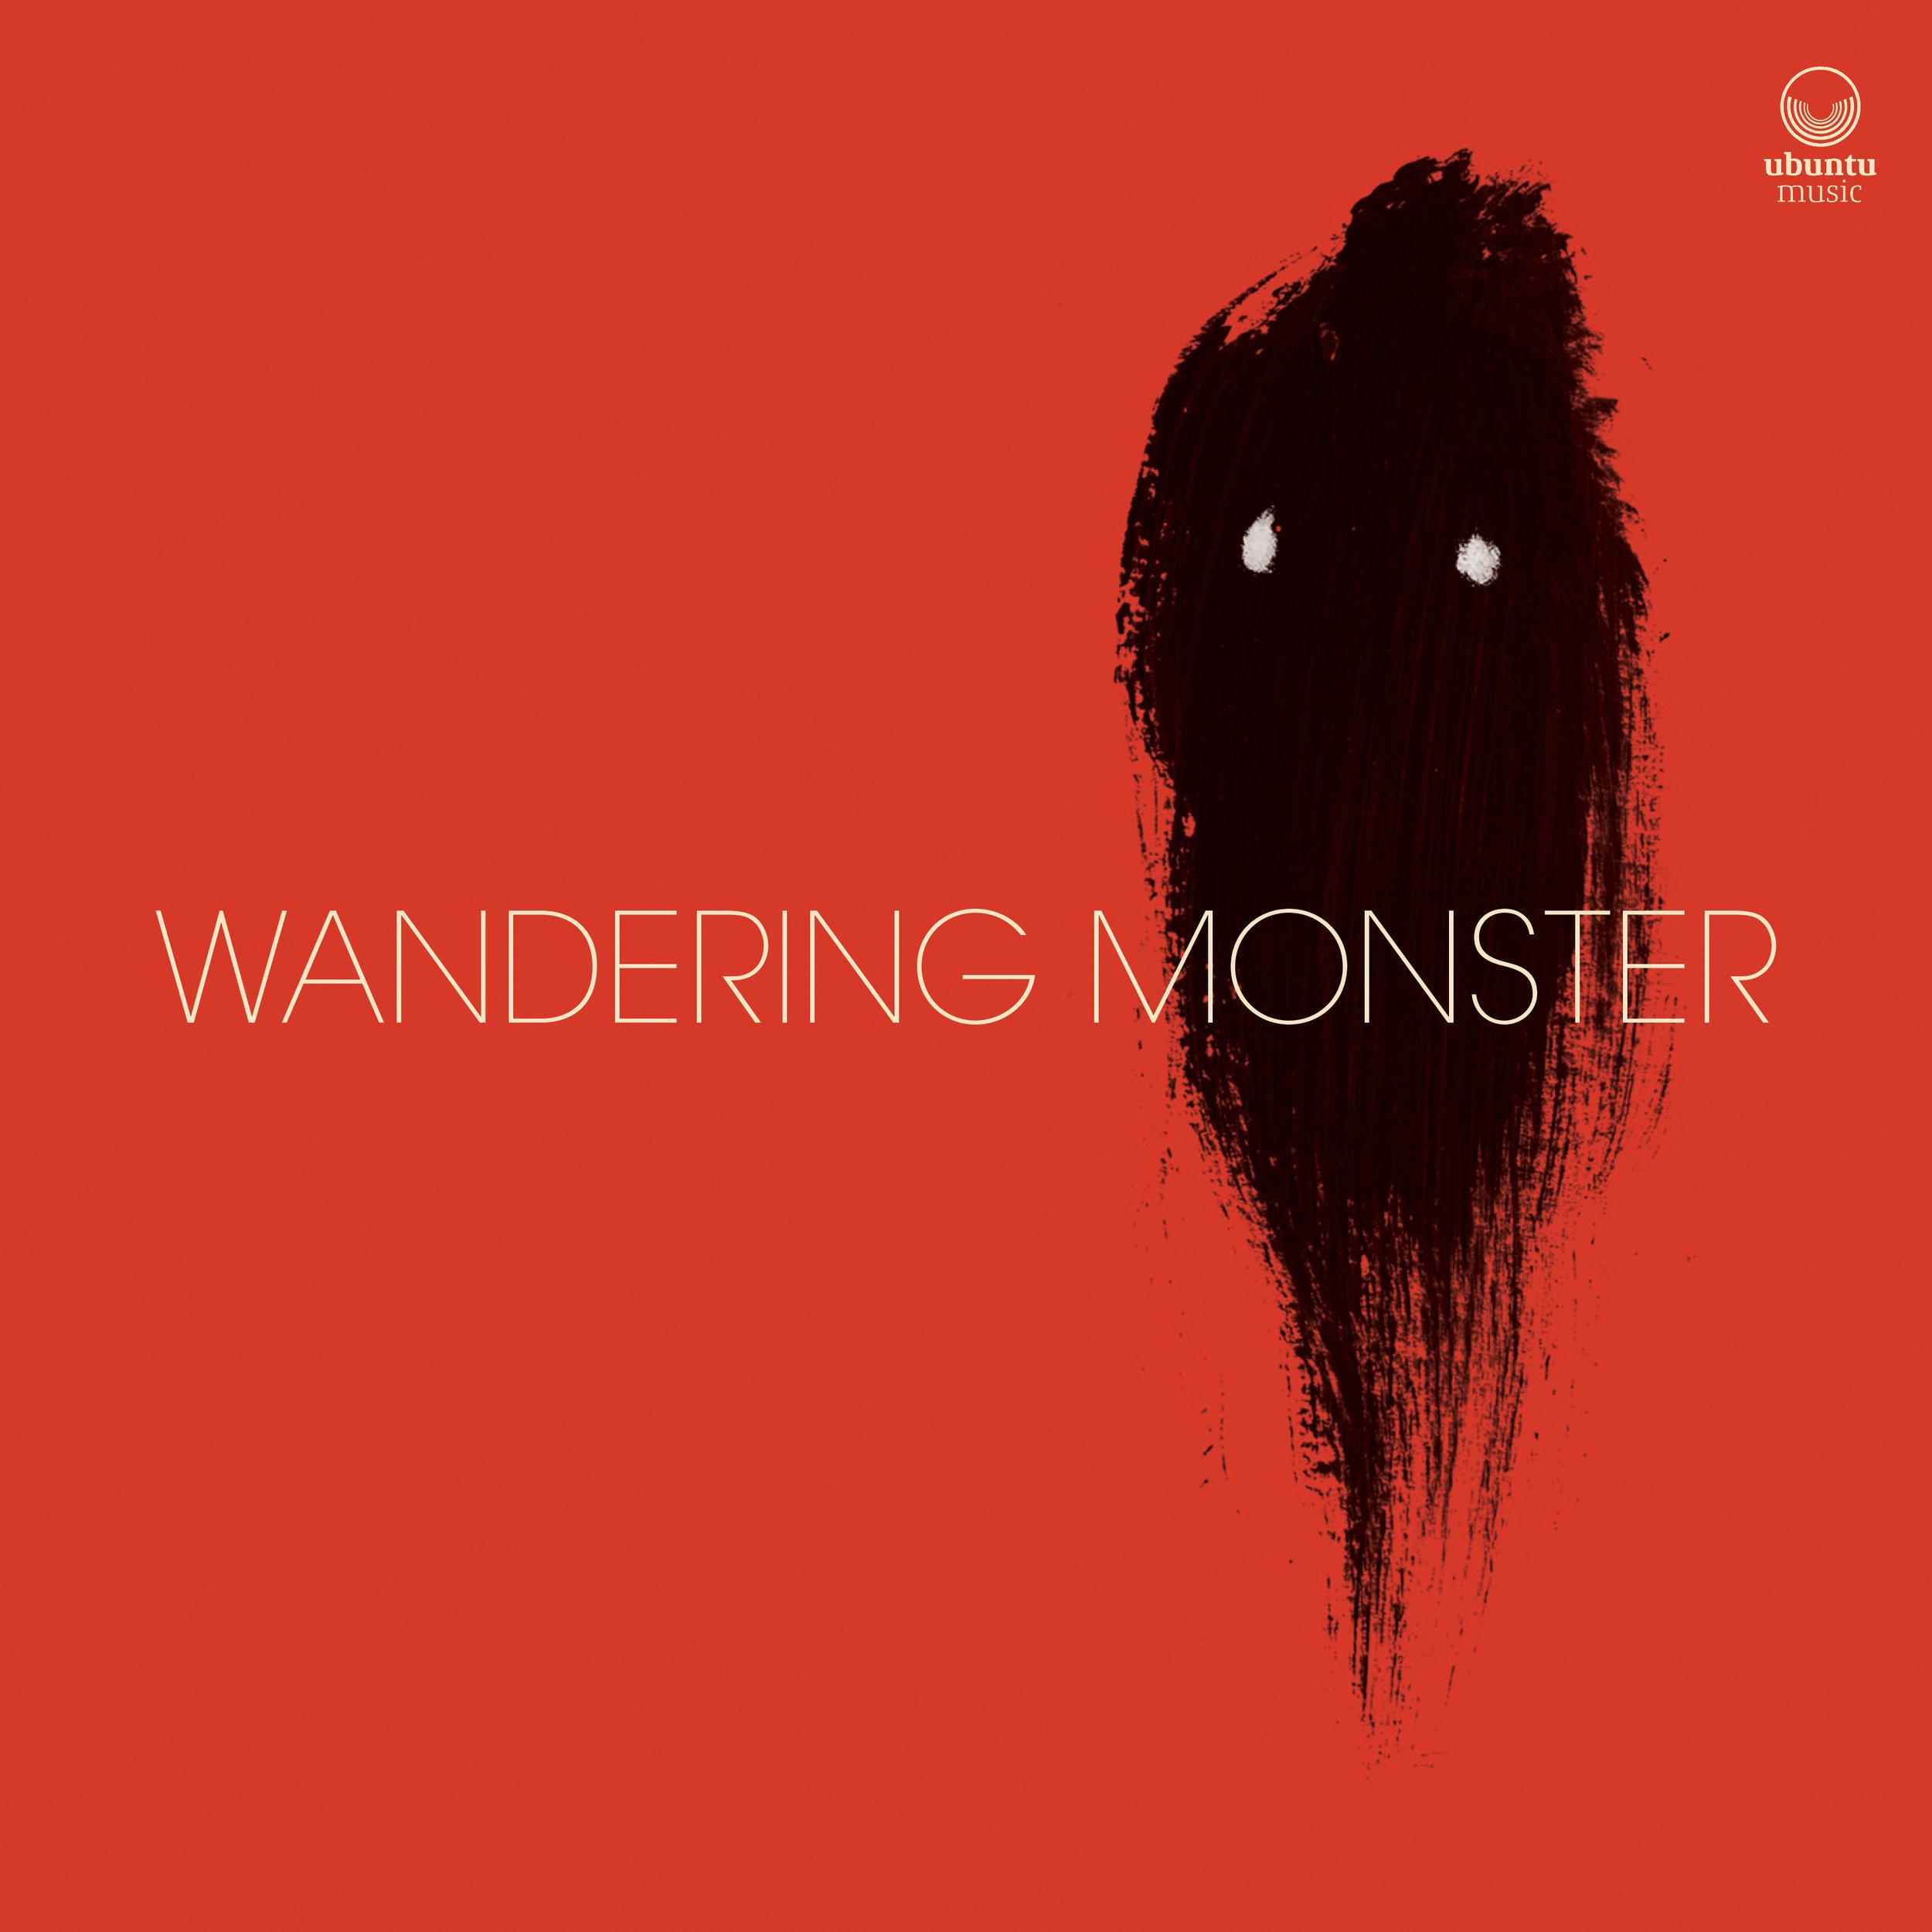 Wandering Monster